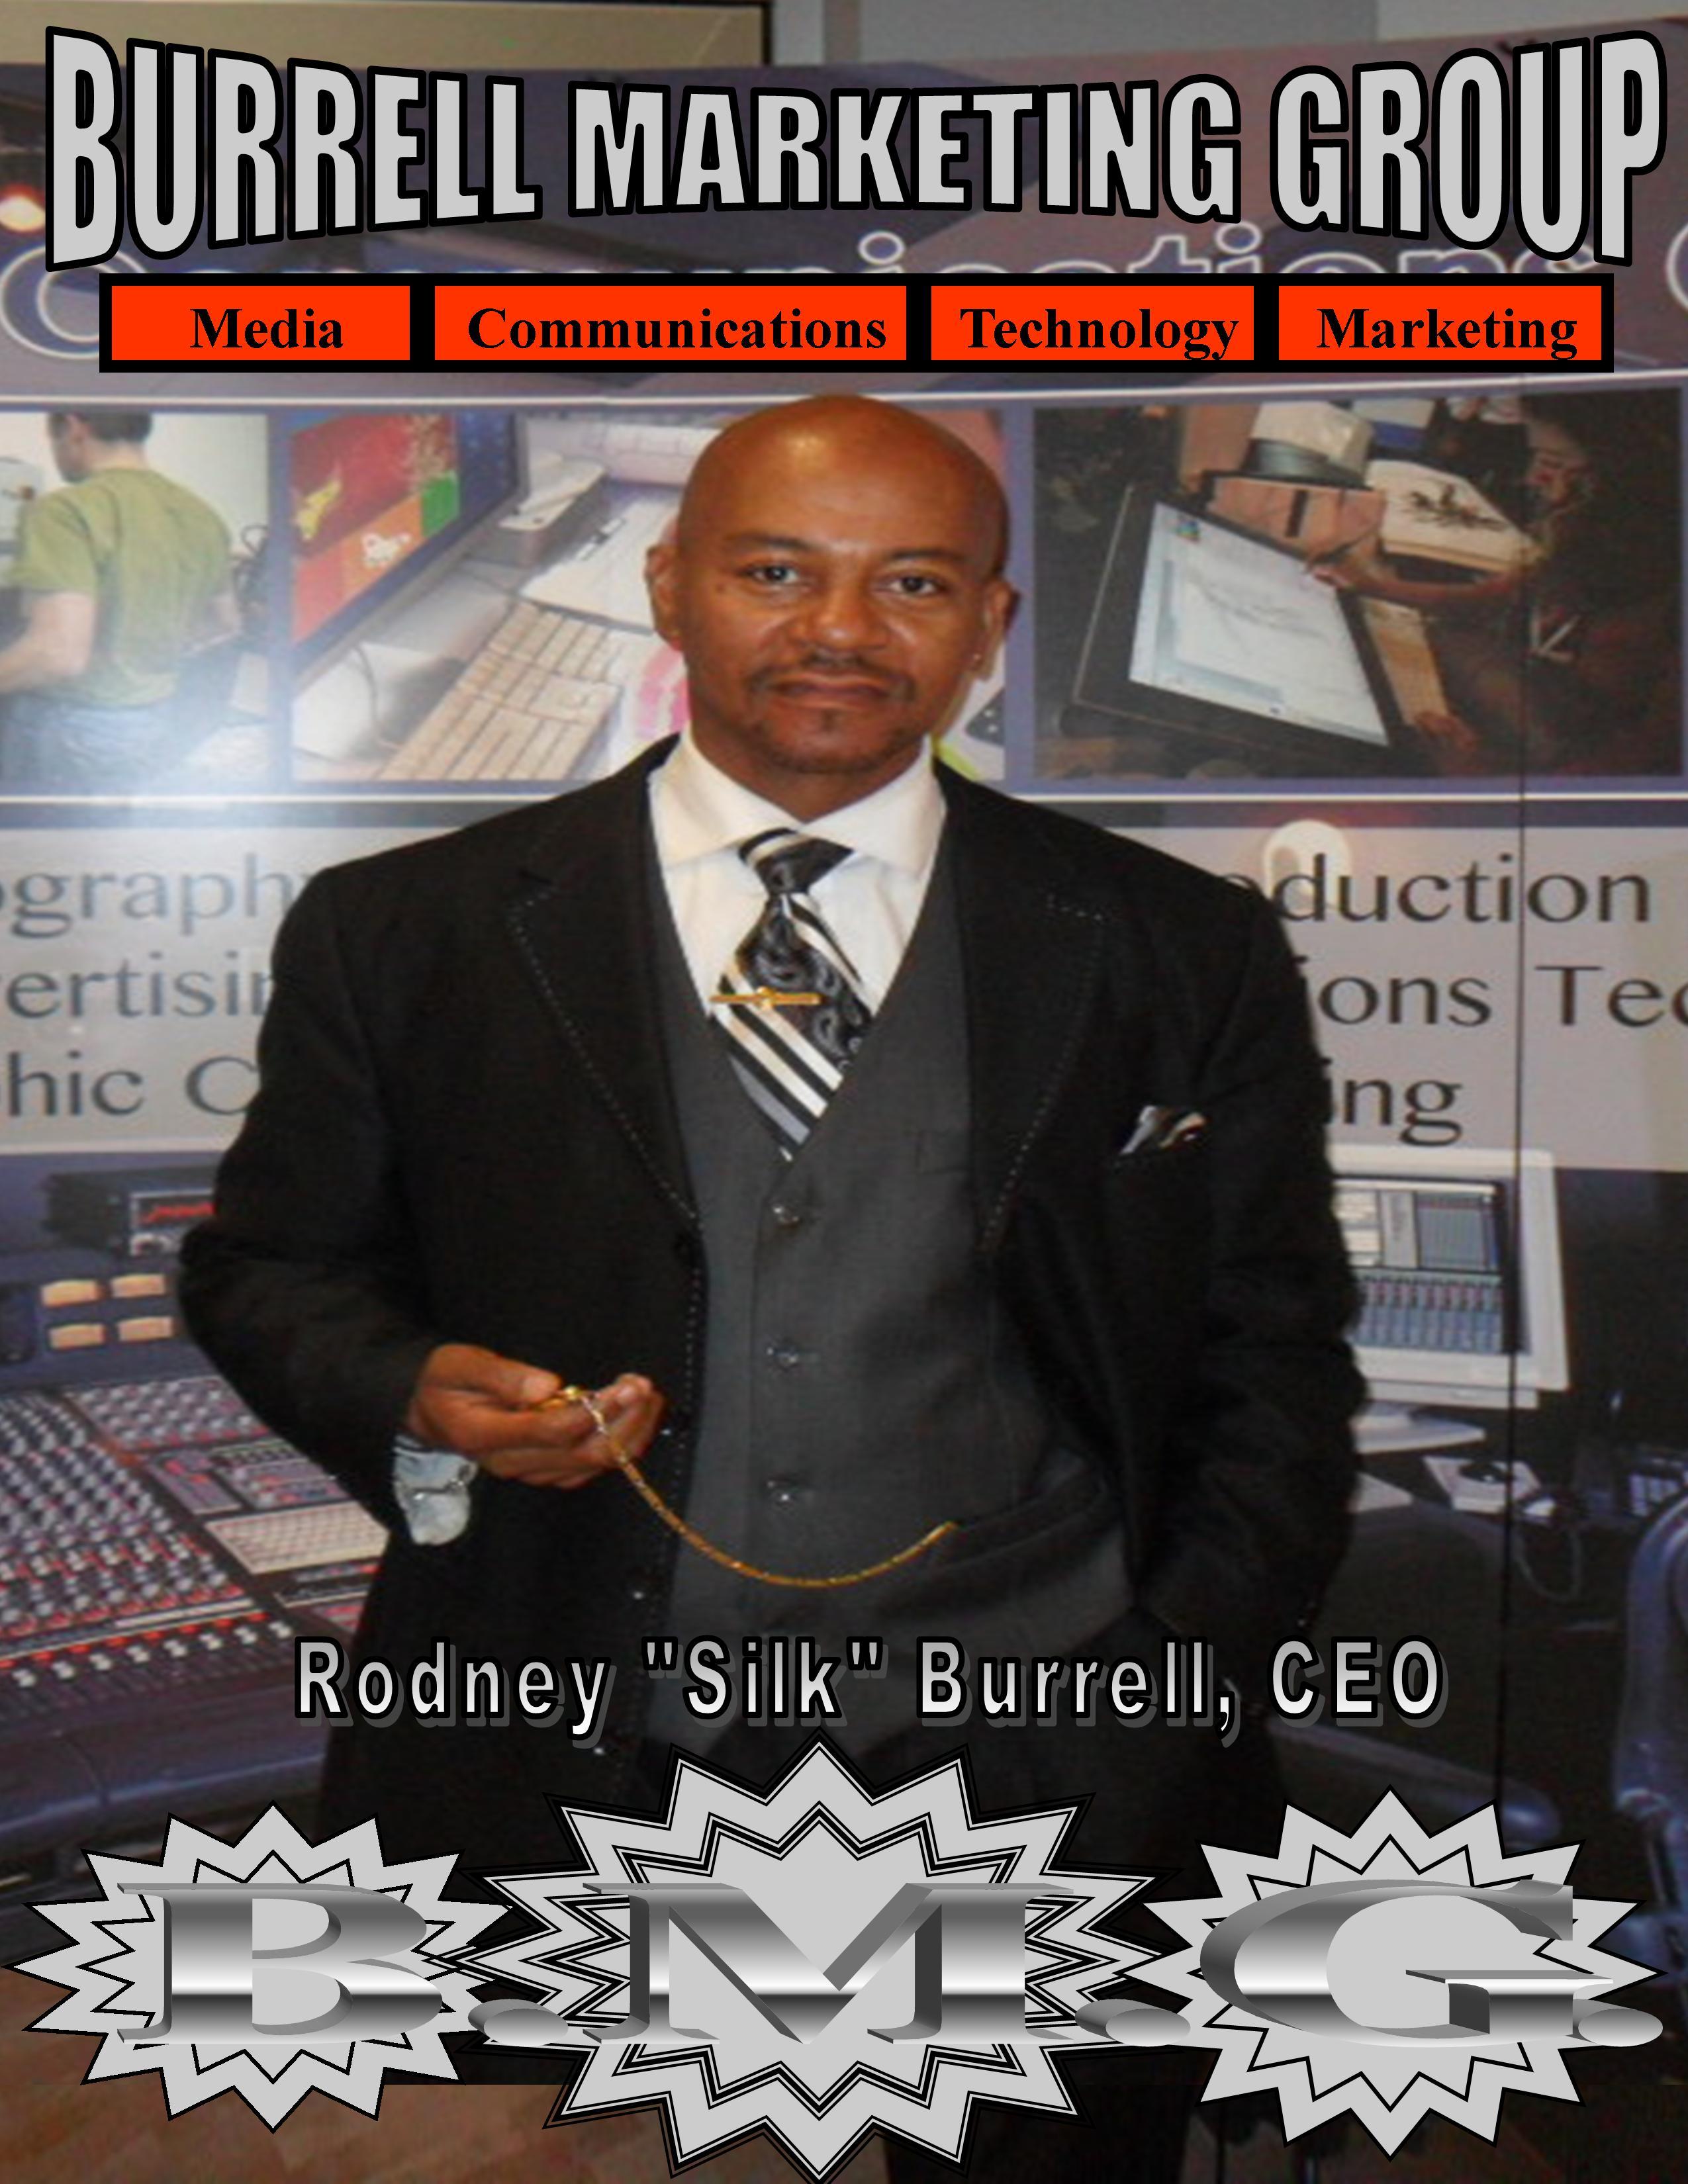 Rodney S. Burrell